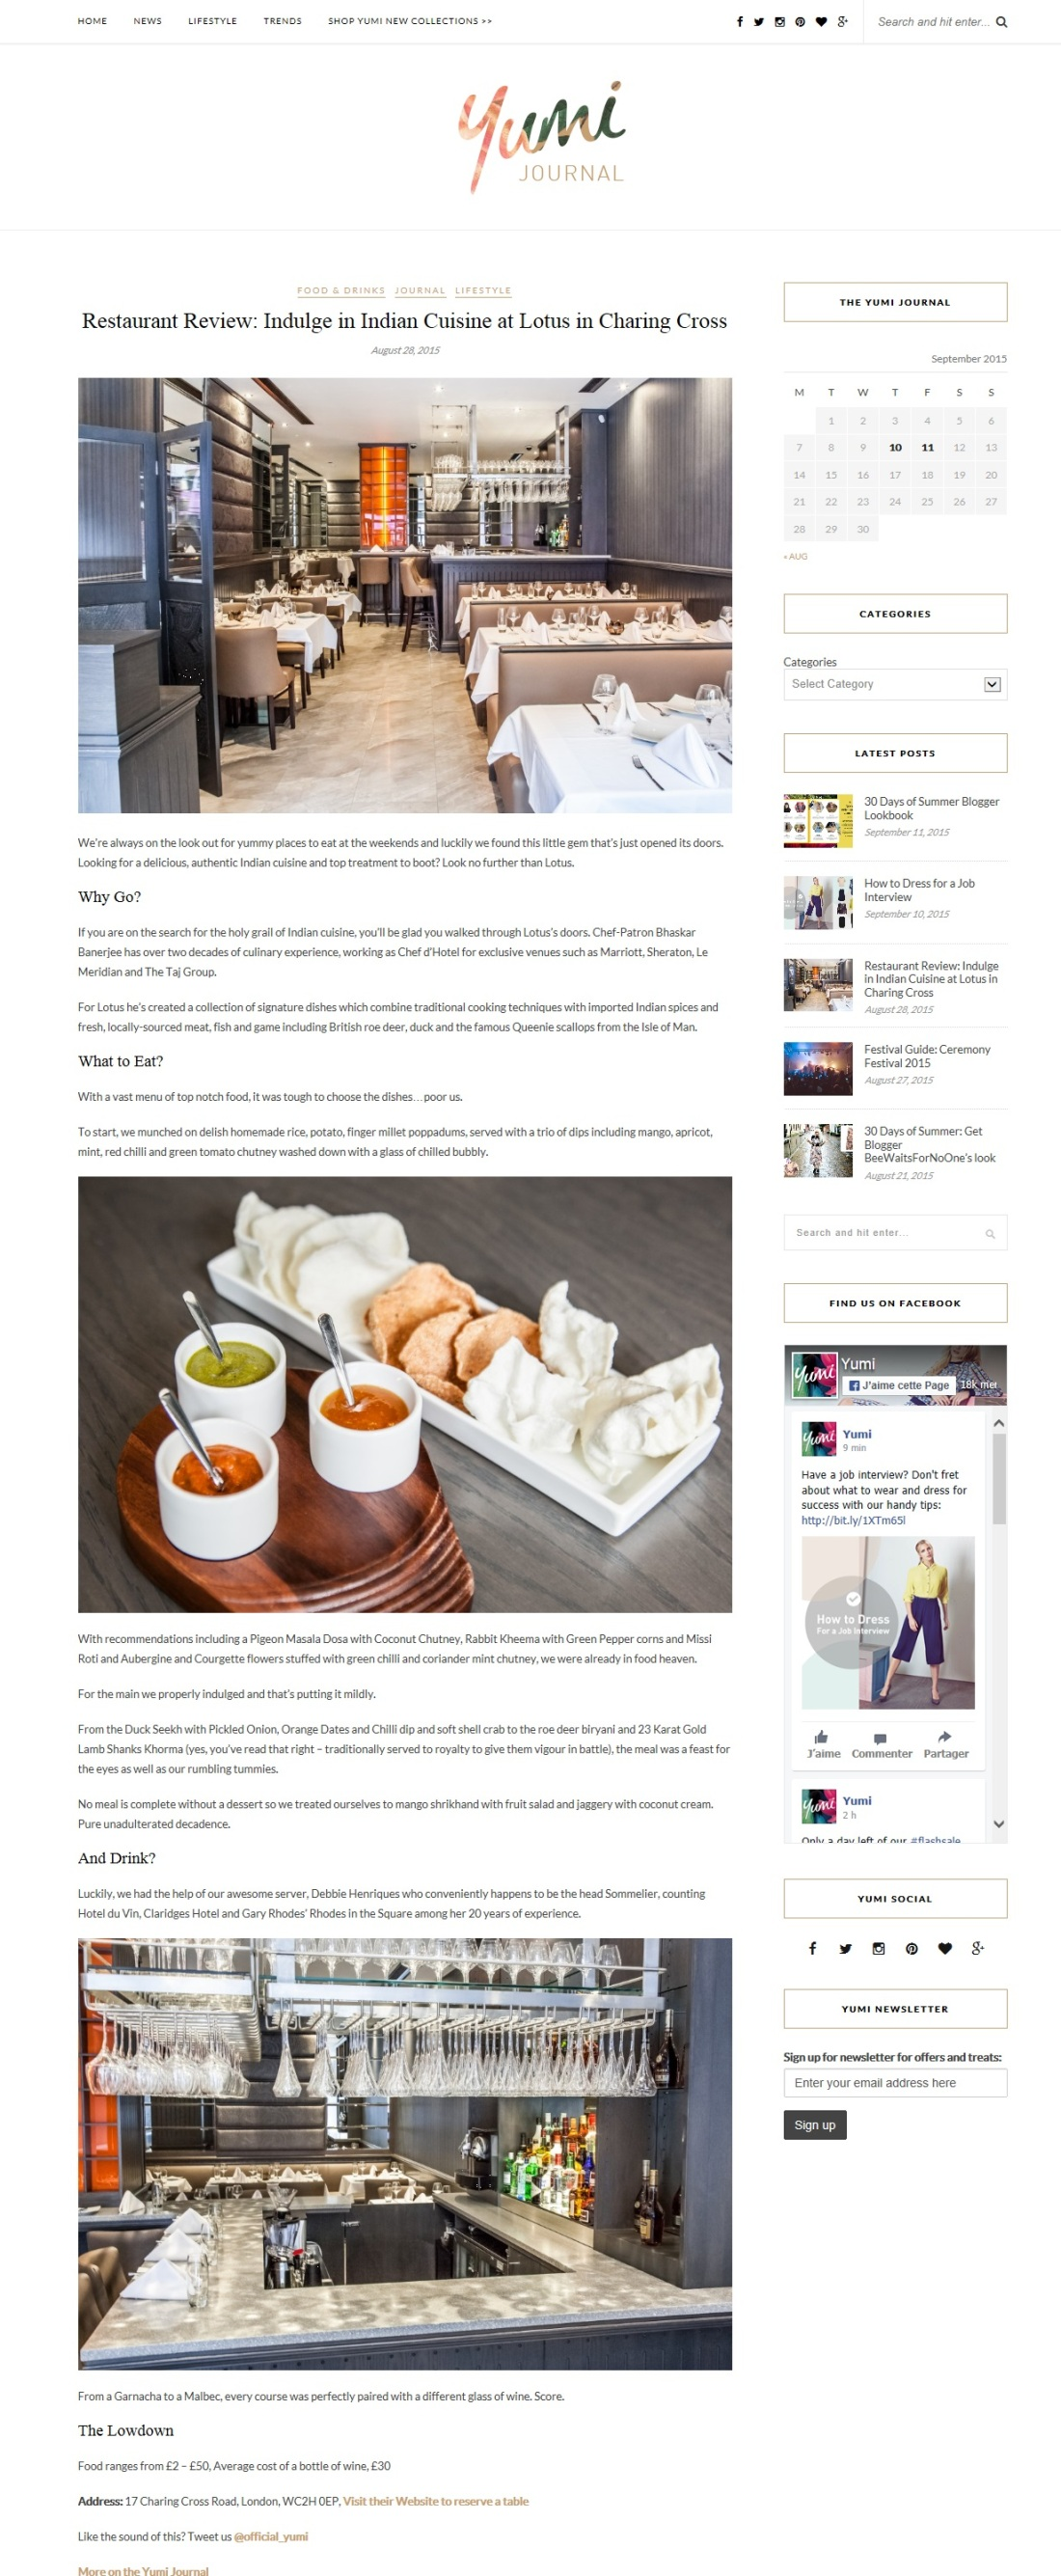 yumi journal restaurant review